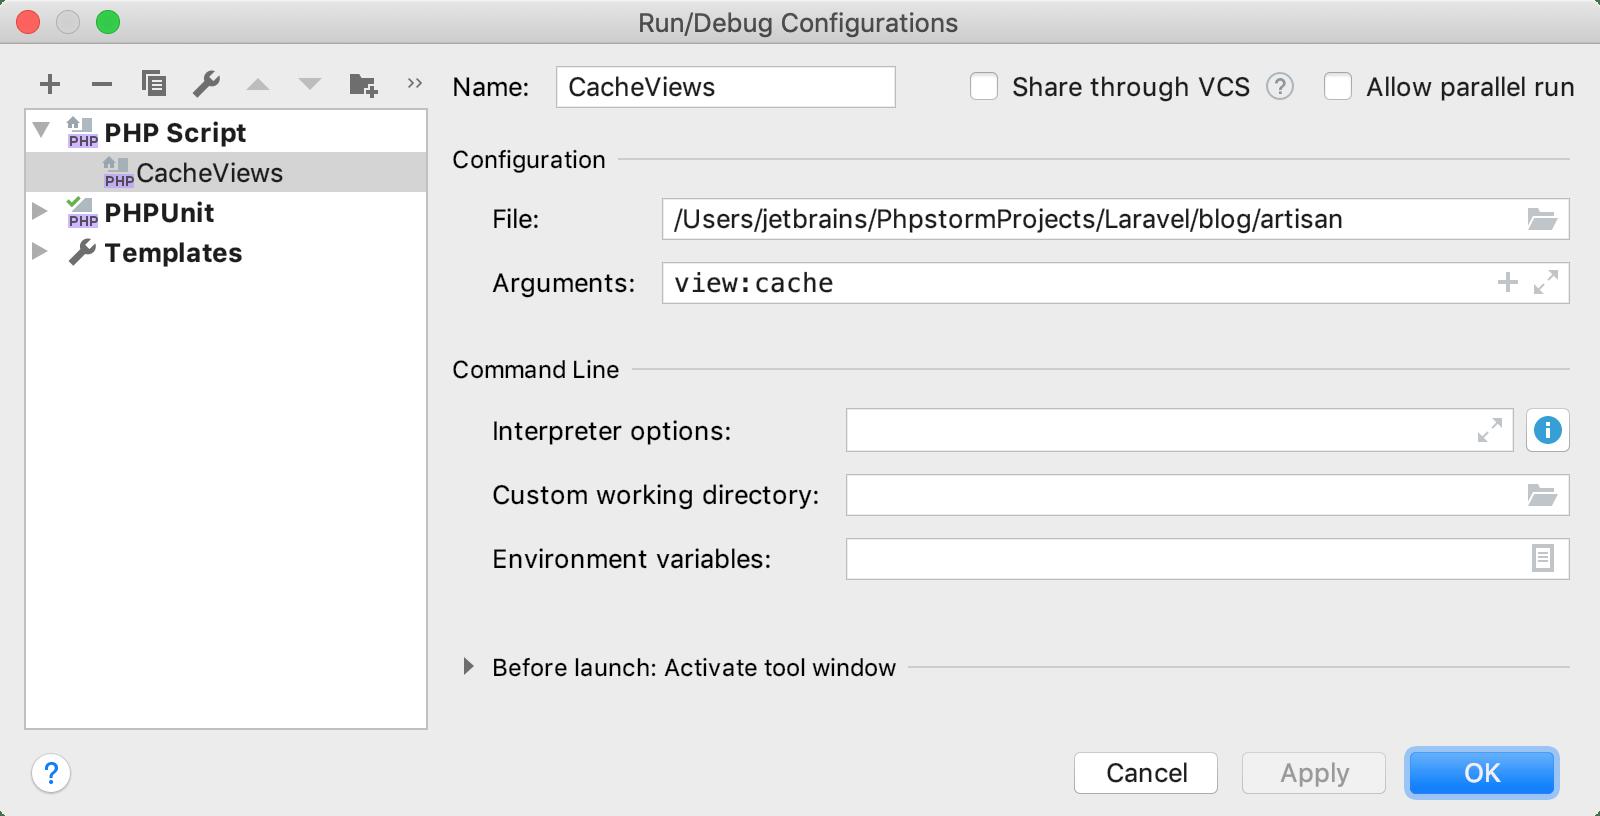 Run/Debug Configurations dialog for Laravel CLI command